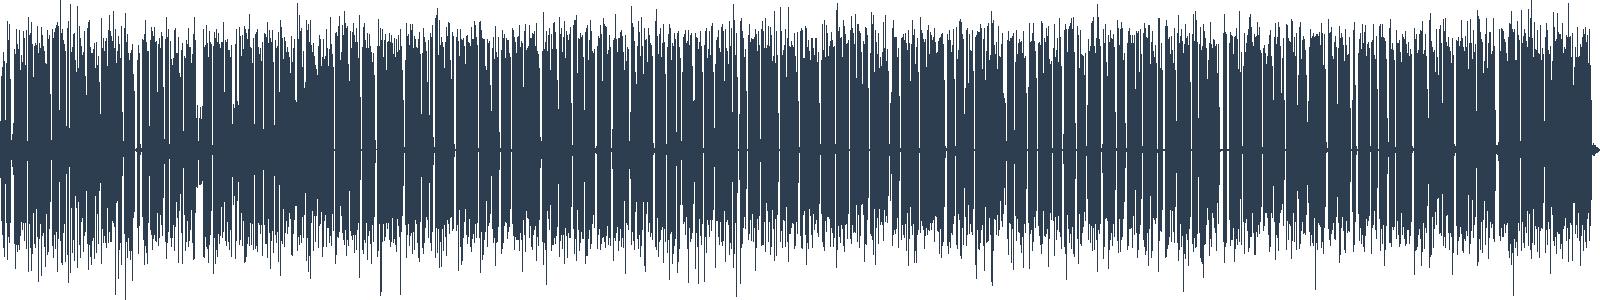 #citatelskydennik: Sofokles - Antigona waveform